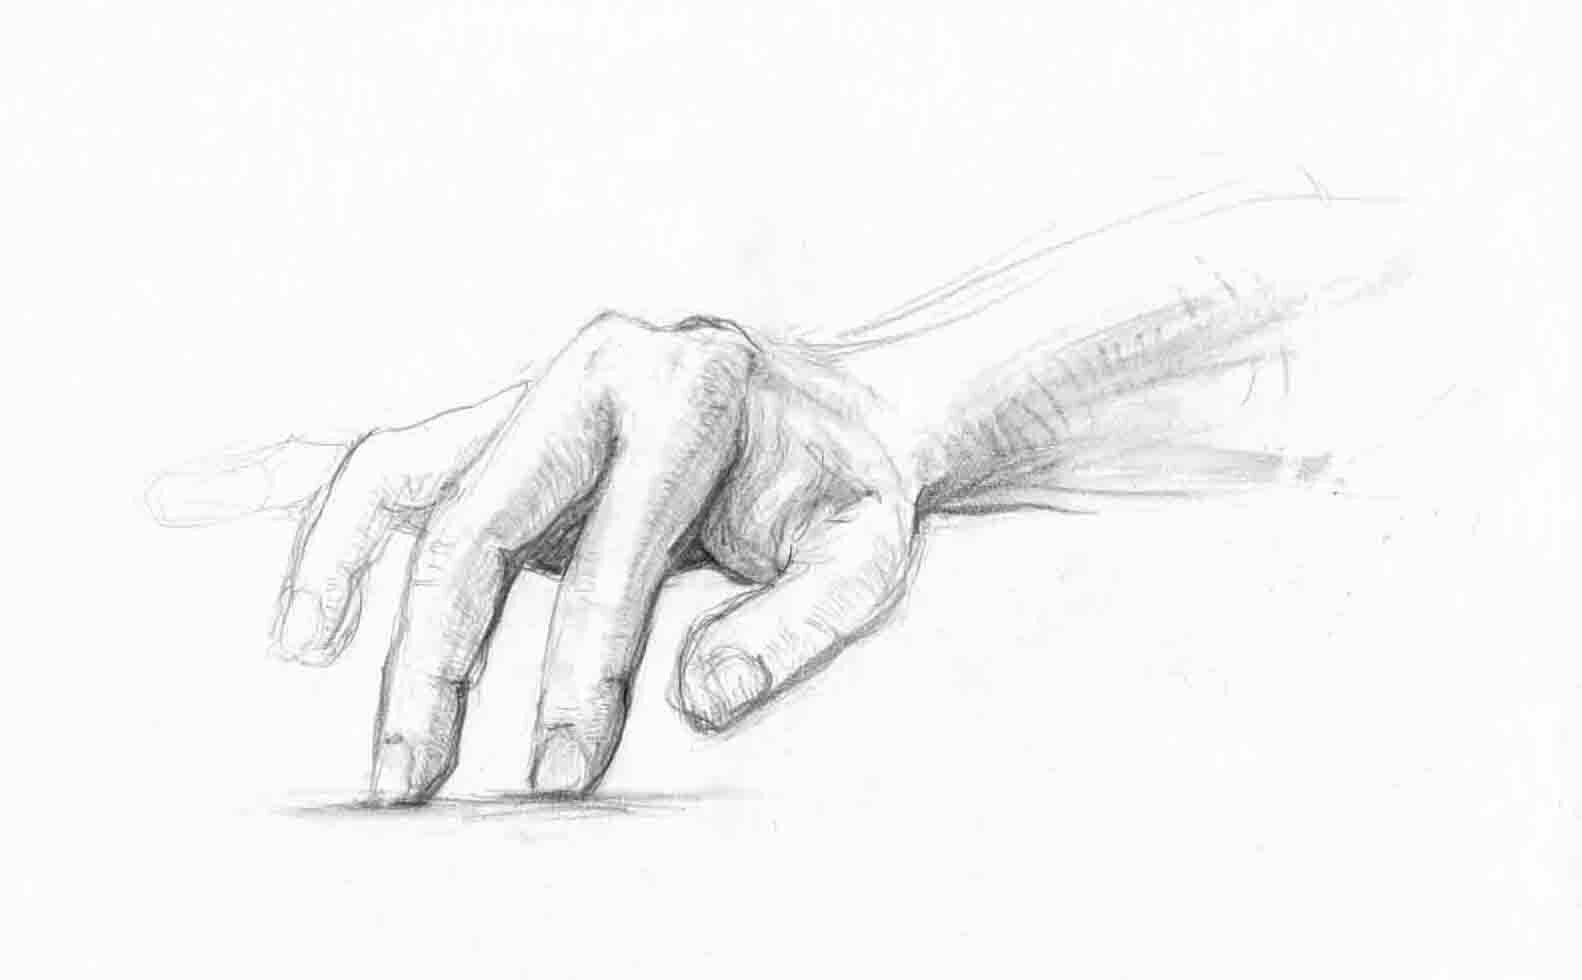 Fluent Fingers